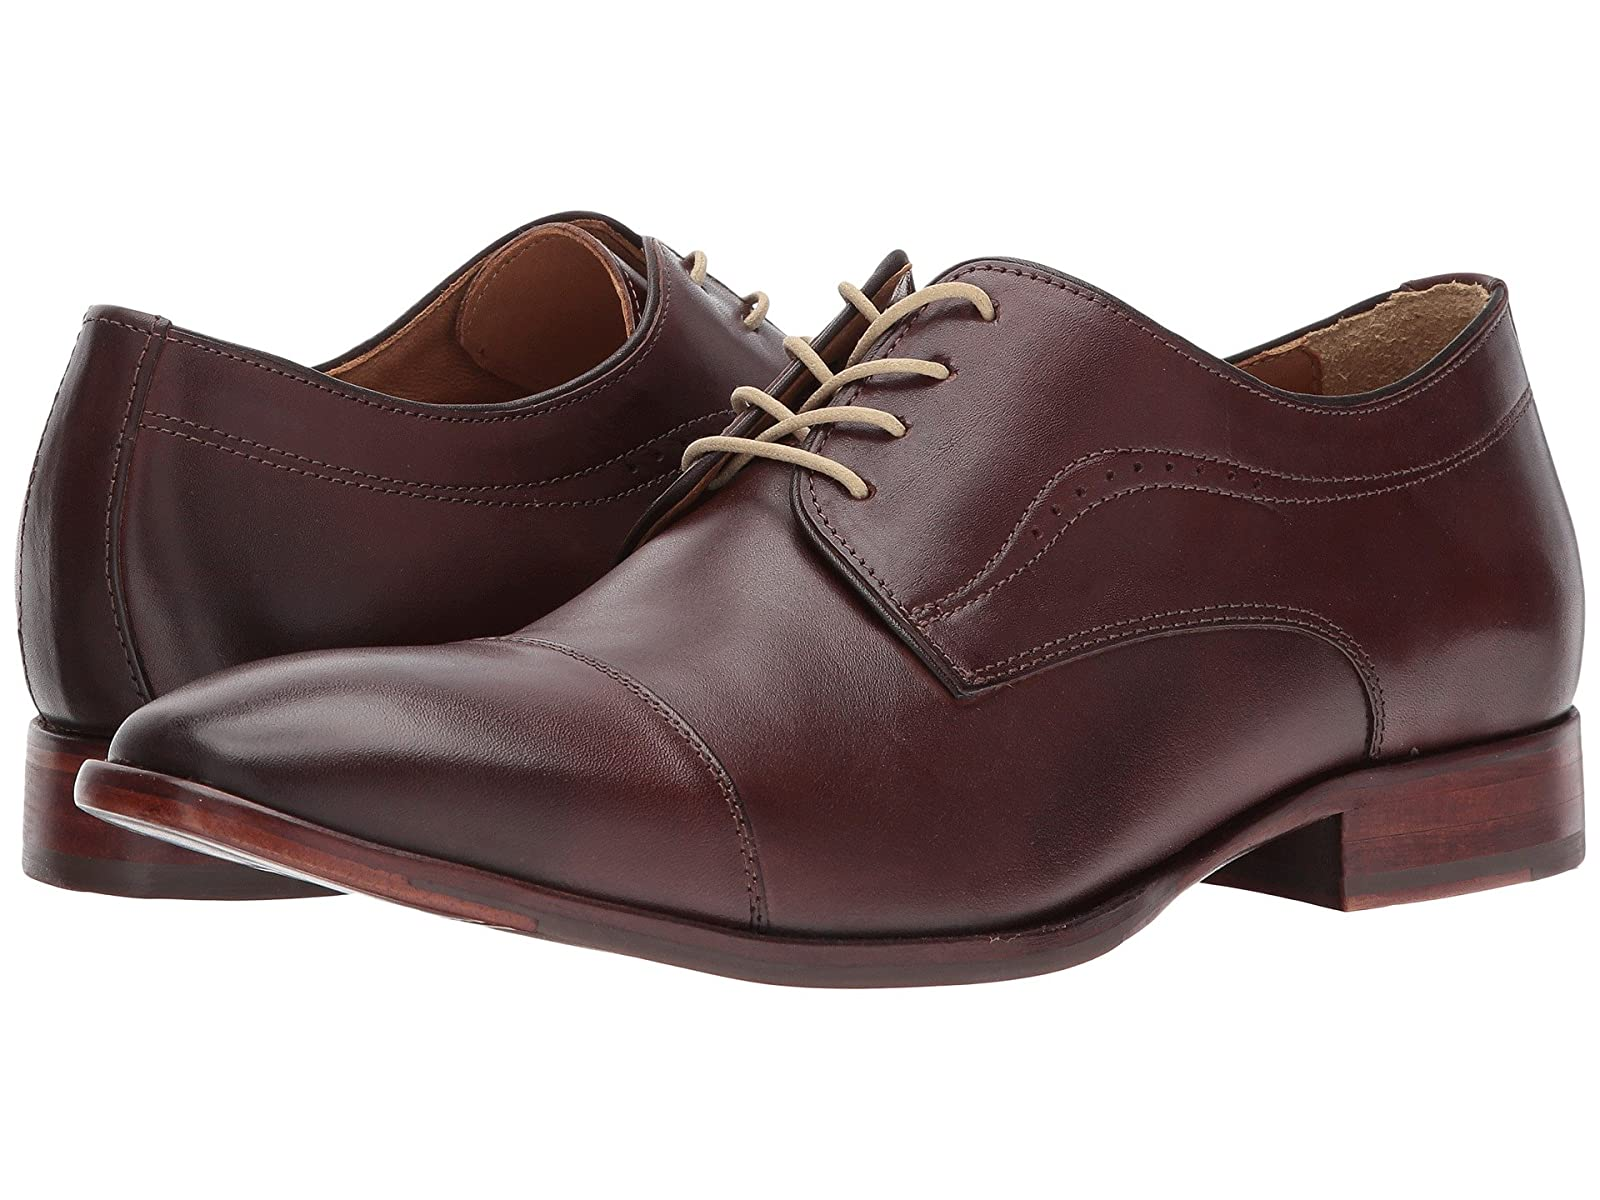 Johnston & Murphy McClain Cap Toe Dress OxfordCheap and distinctive eye-catching shoes